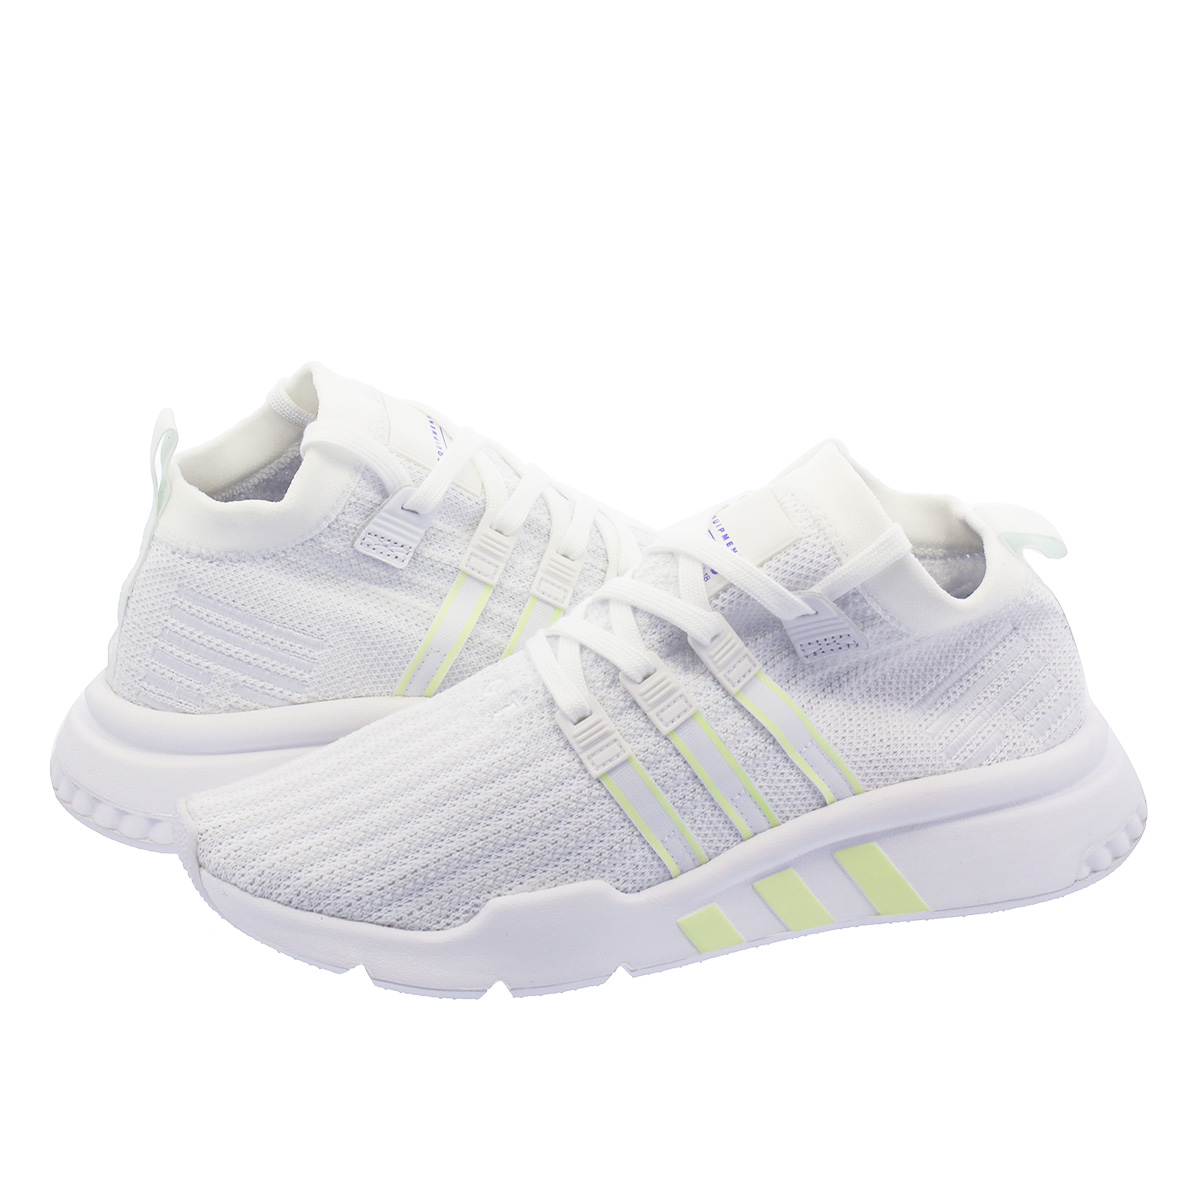 adidas EQT SUPPORT MID ADV PK Adidas EQT support mid ADV PK RUNNING WHITE CRYSTAL  WHITE ENERGY INK b37455 7ba0f15ba9f6